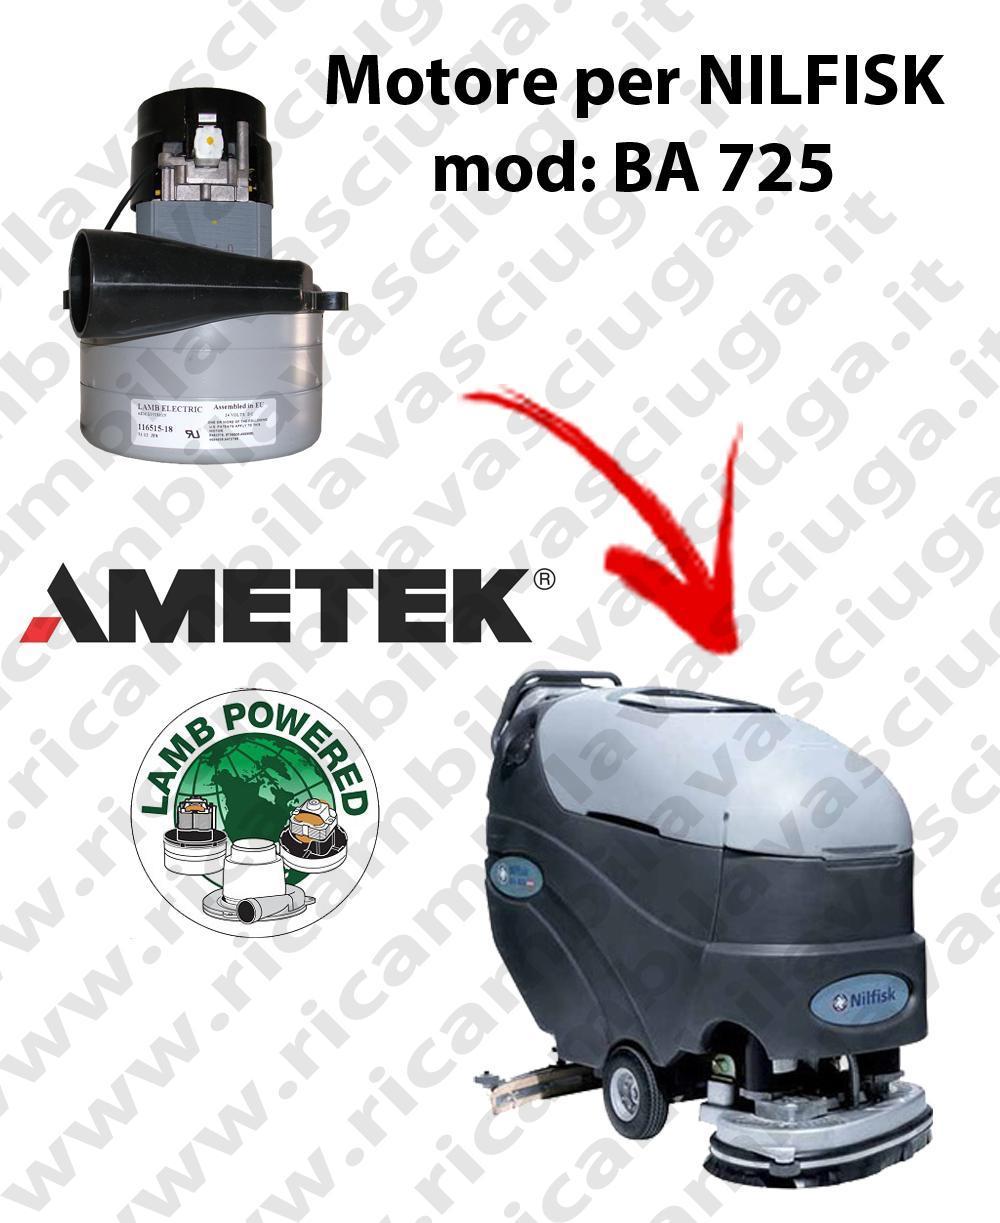 BA 725 Saugmotor LAMB AMETEK für scheuersaugmaschinen NILFISK